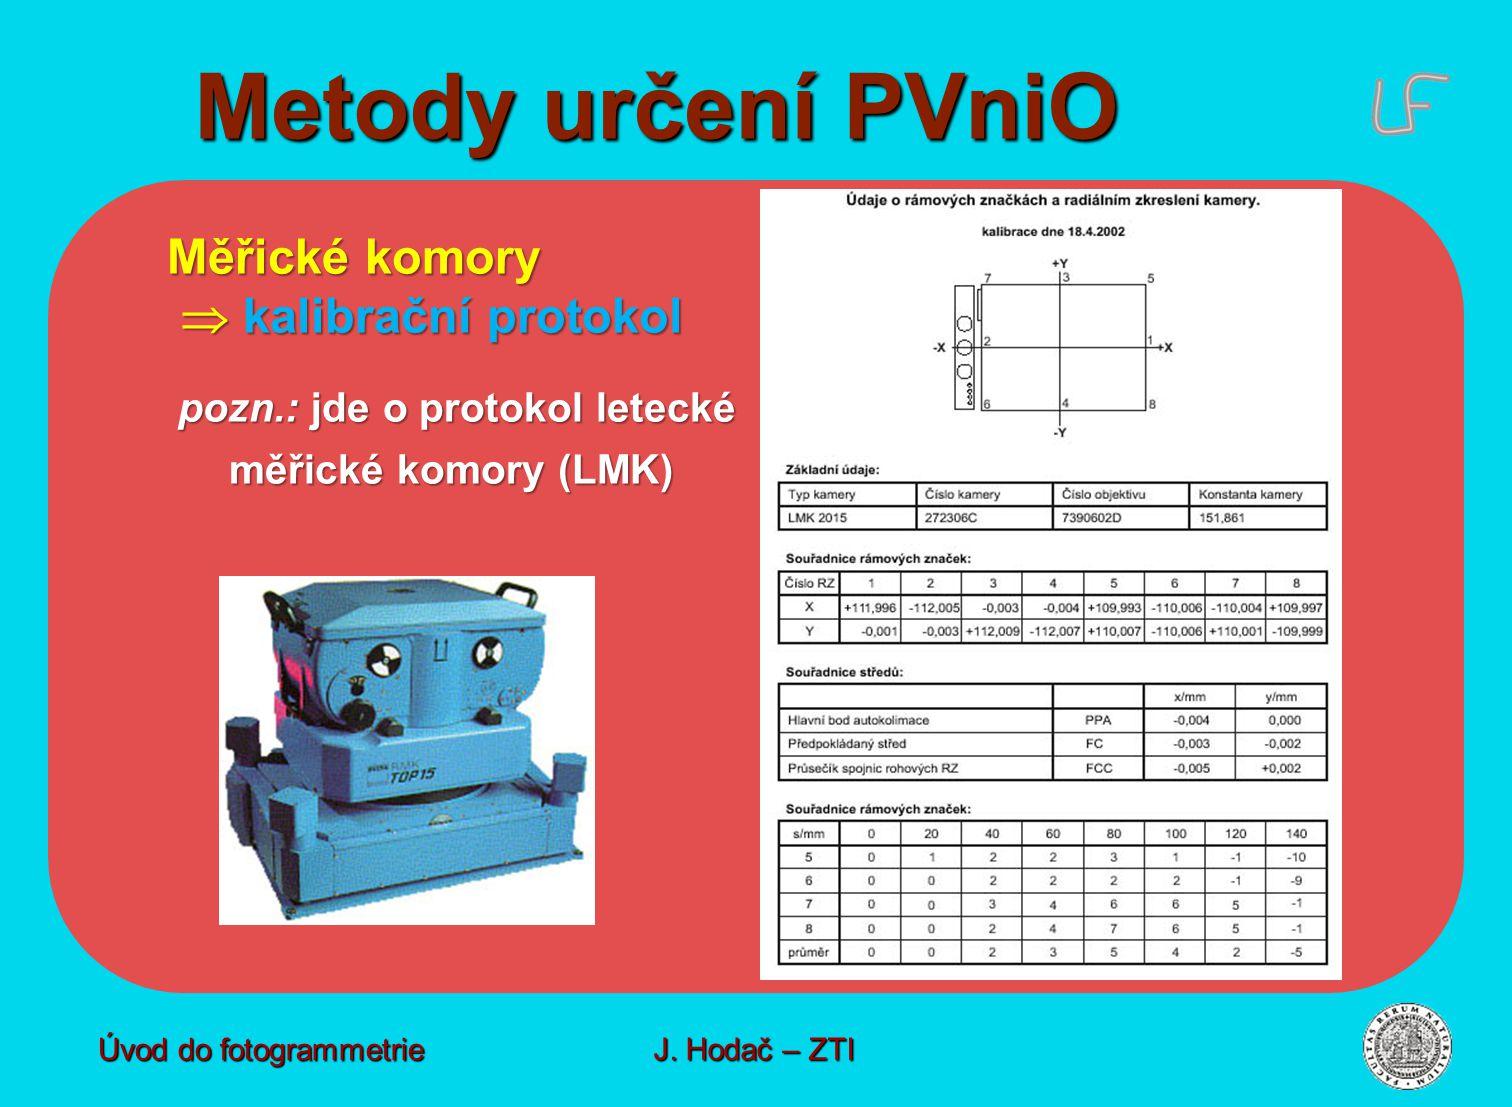 Metody určení PVniO Úvod do fotogrammetrie J. Hodač – ZTI Měřické komory  kalibrační protokol  kalibrační protokol pozn.: jde o protokol letecké poz